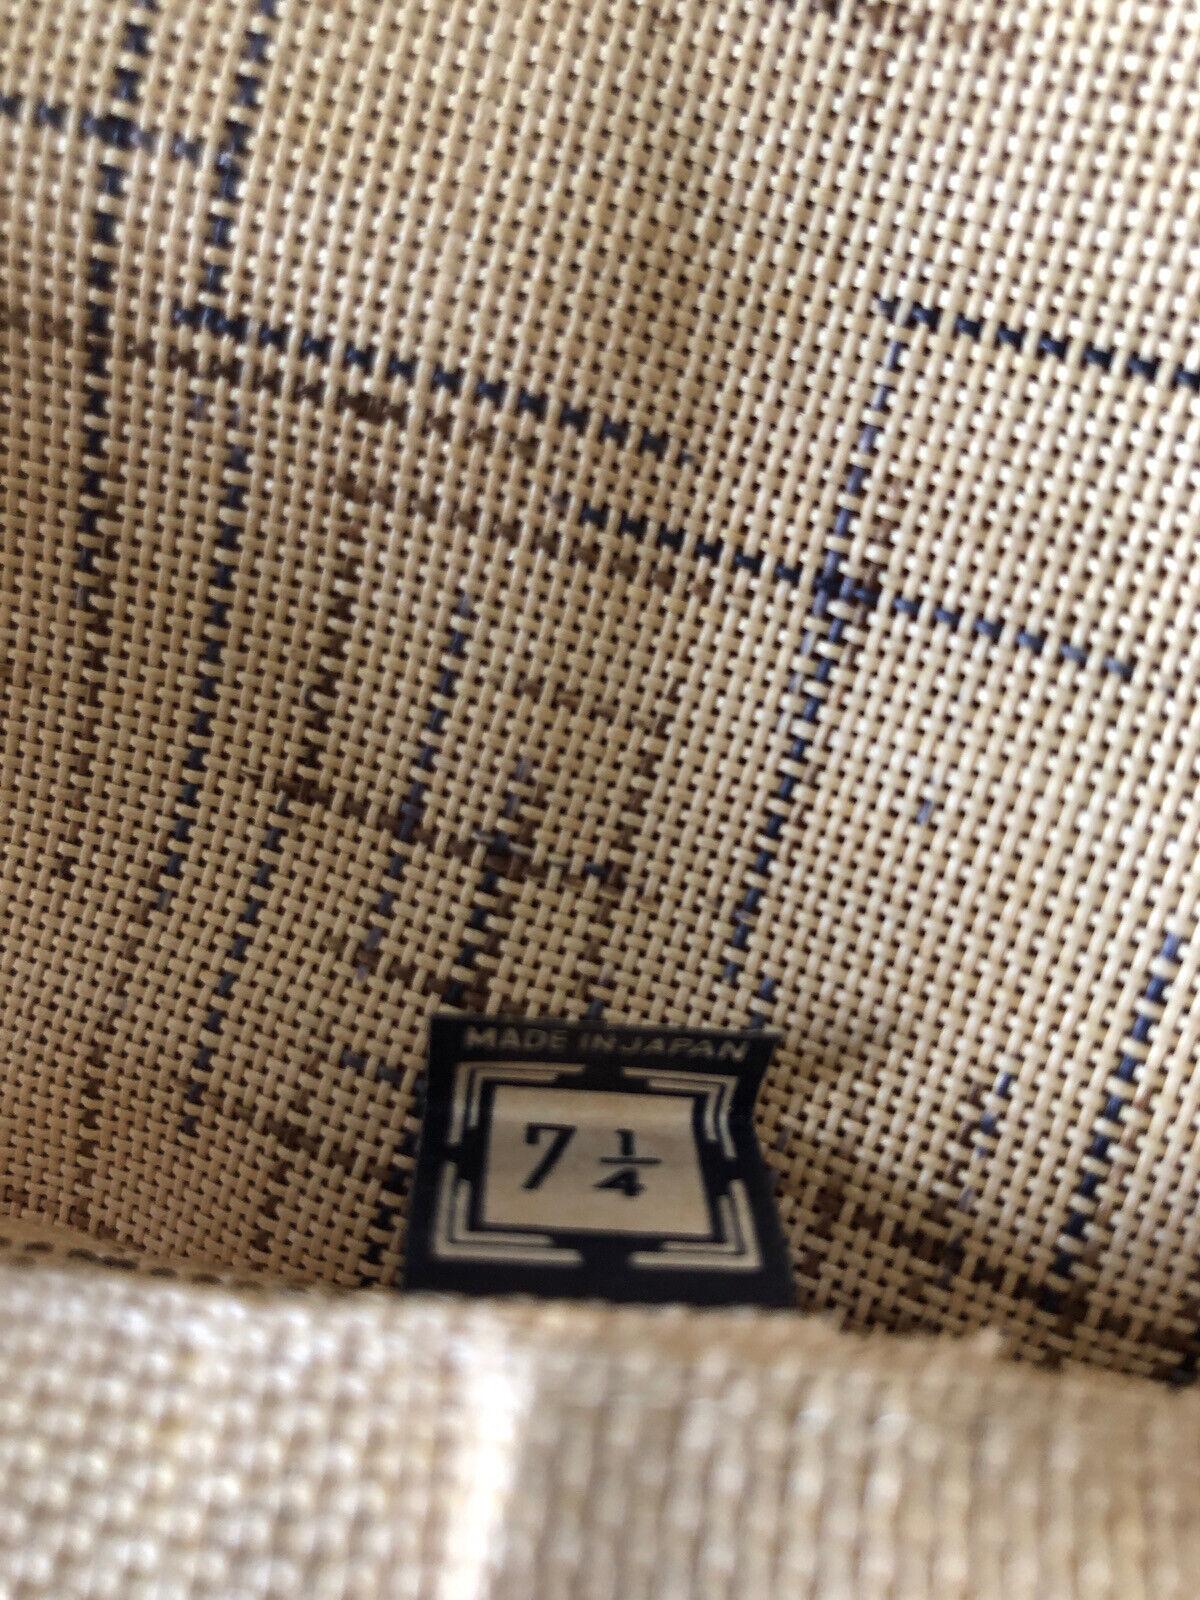 1950's Men's Japan Straw Newsboy Cap Size 7 1/4 - image 7